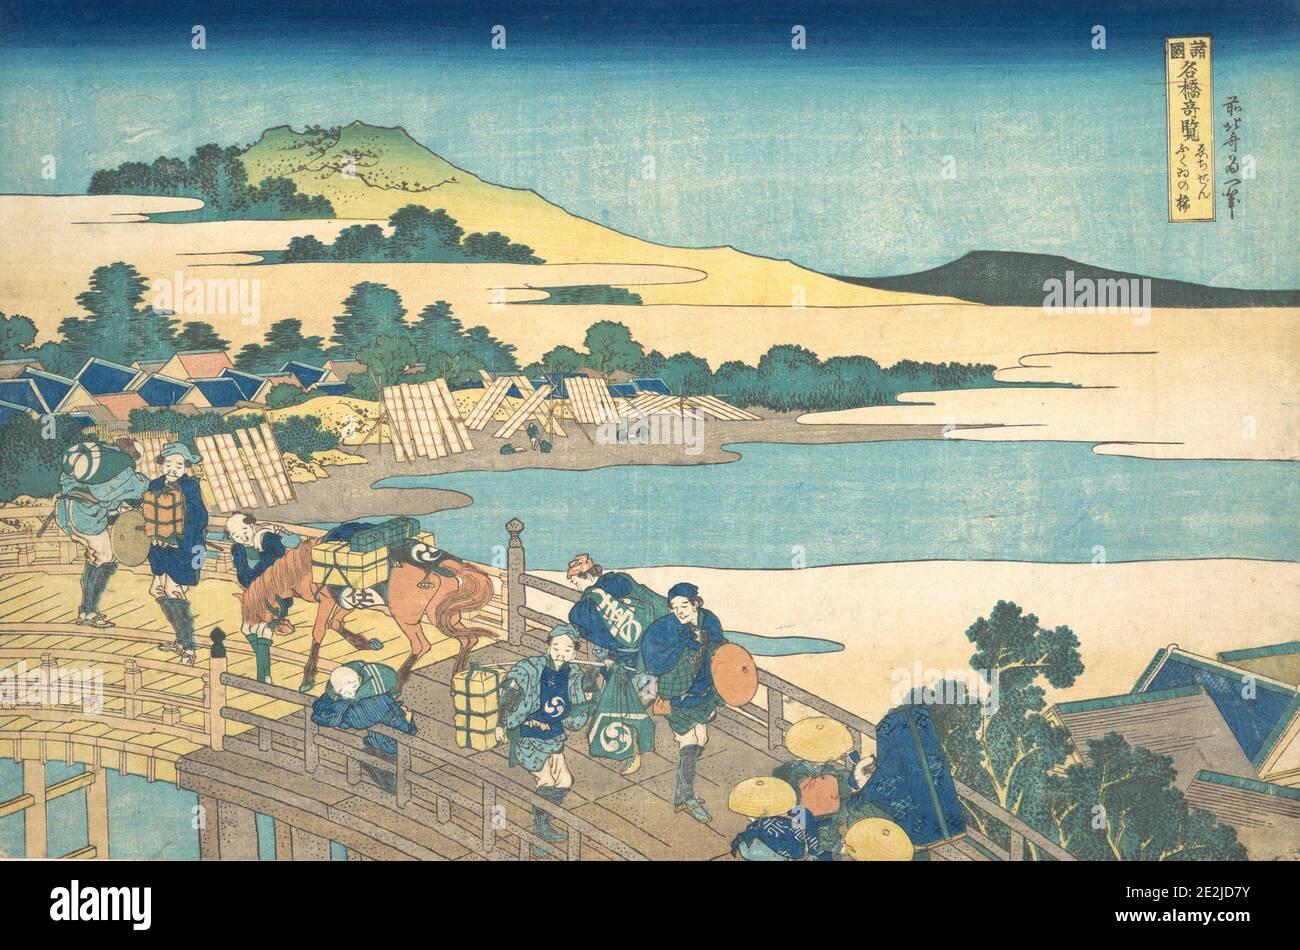 Katsushika Hokusai Horse High Resolution Stock Photography And Images Alamy